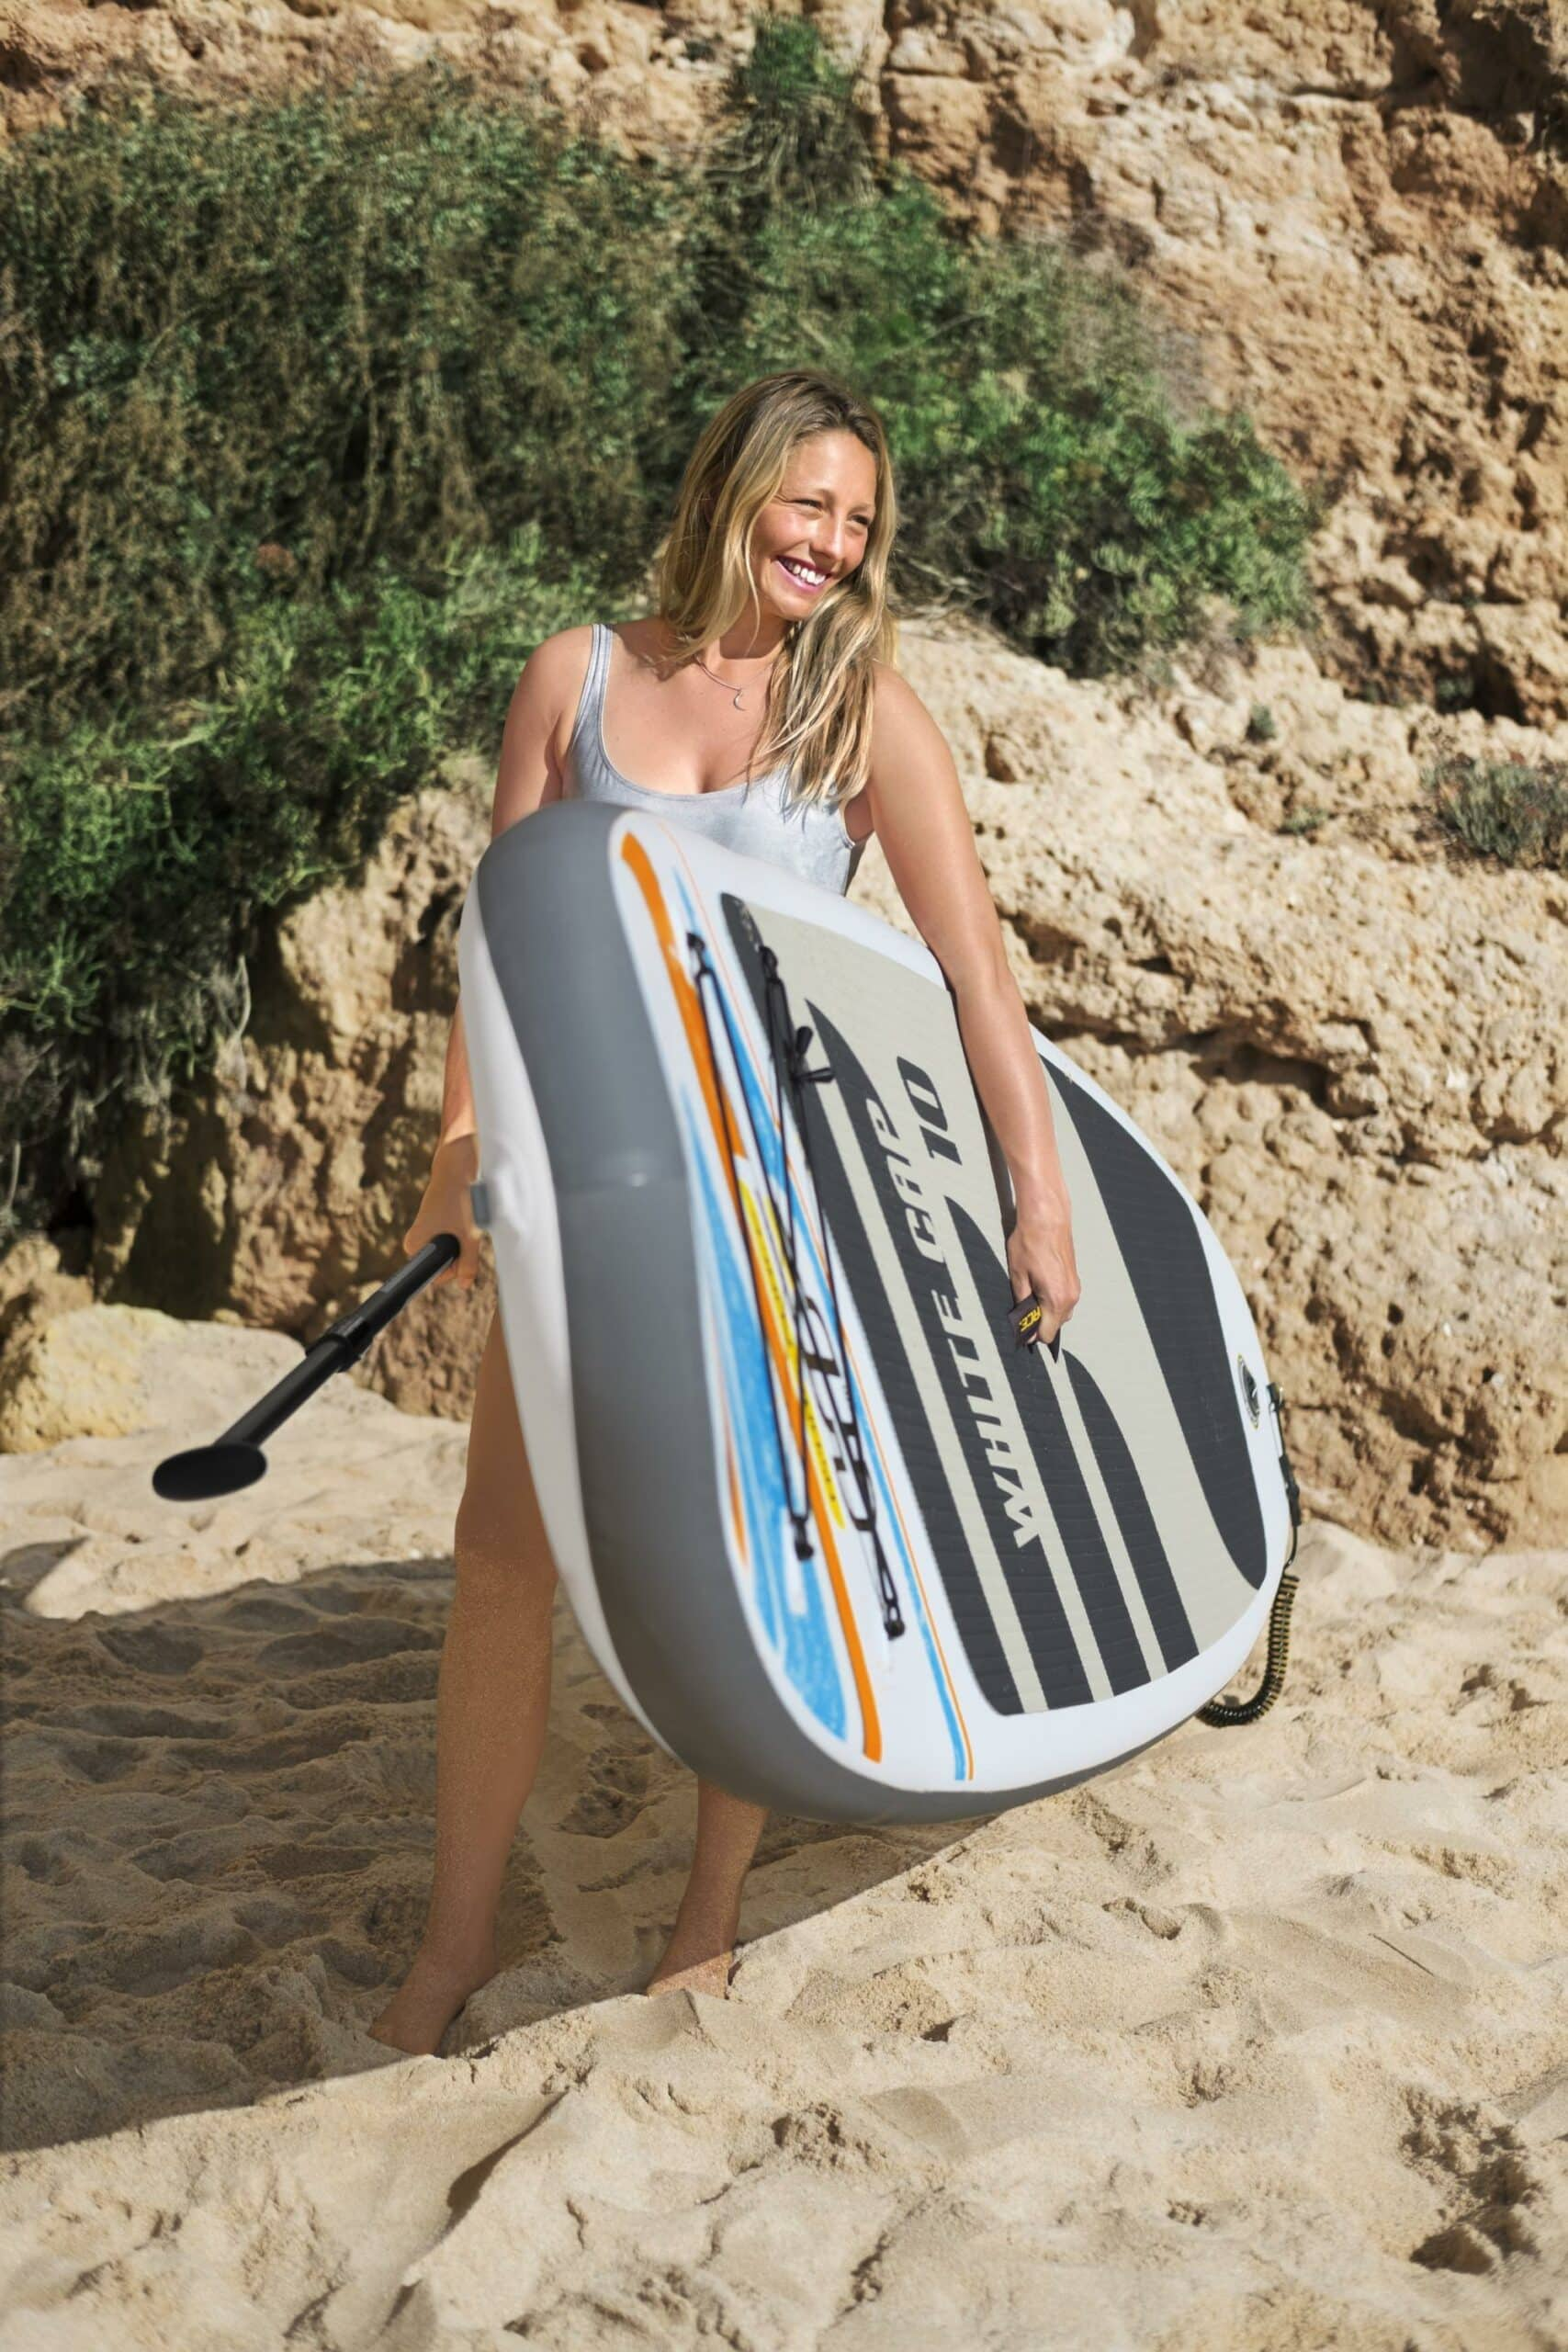 White Cap Paddle Board Sup Brett